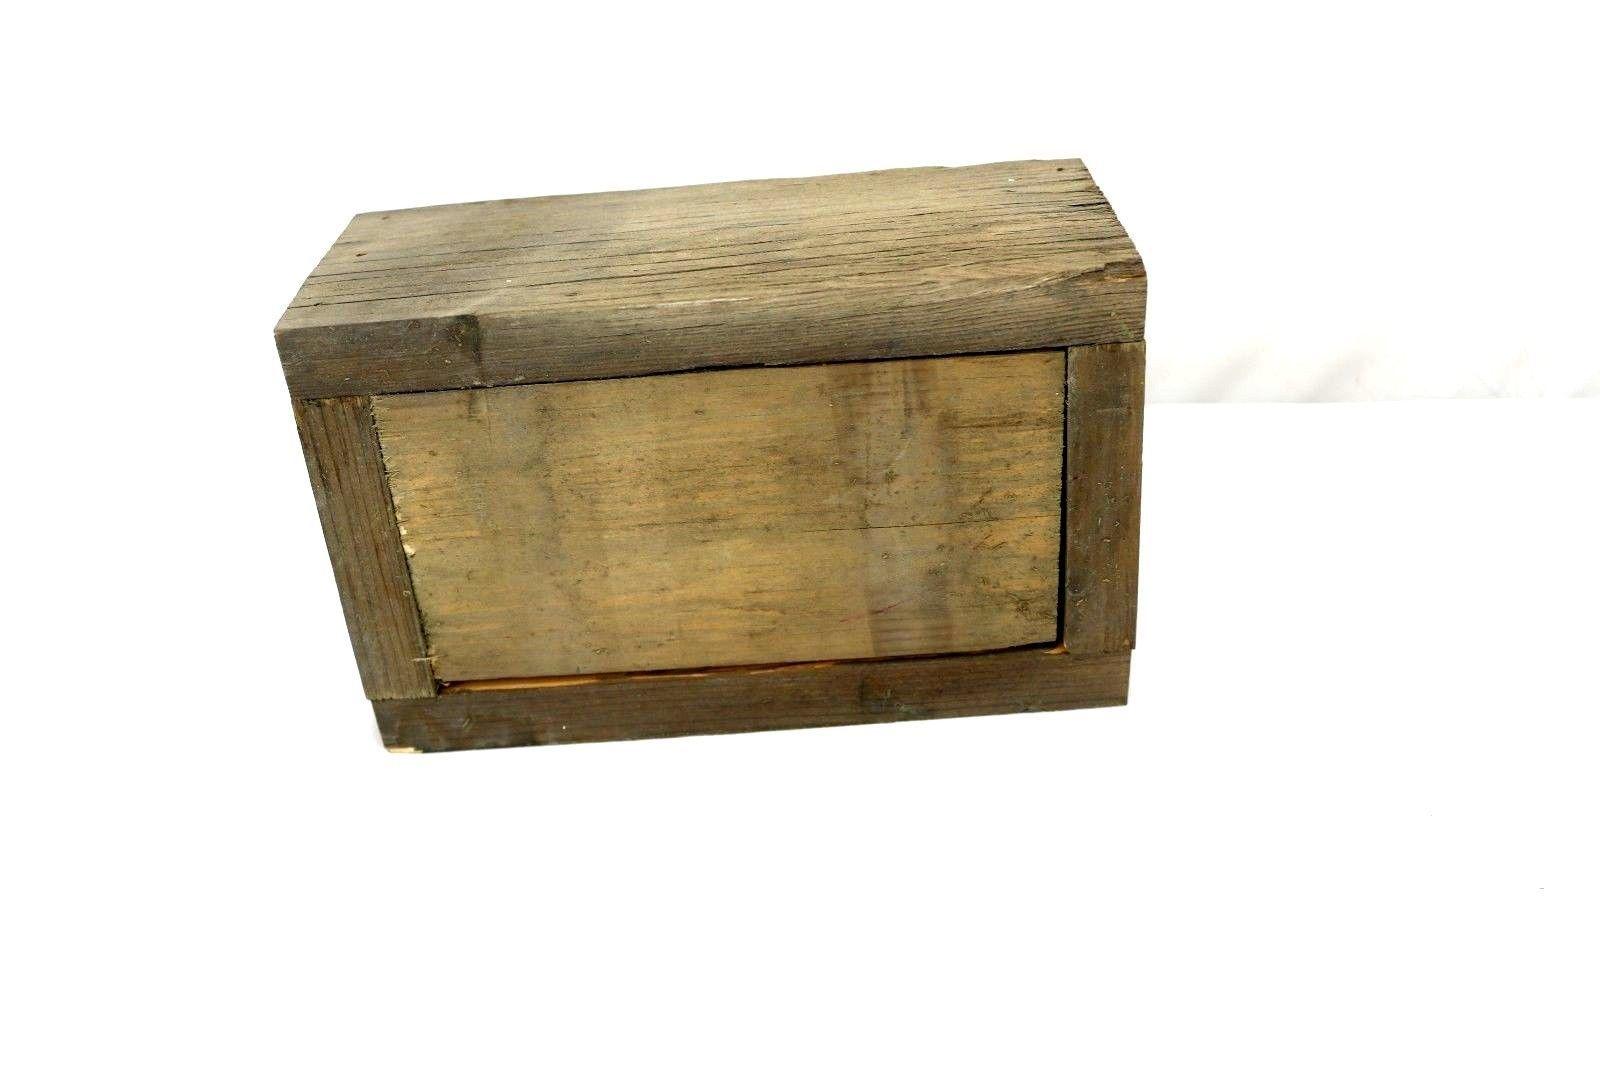 Handmade Rustic Wooden Planter Box Rectangle